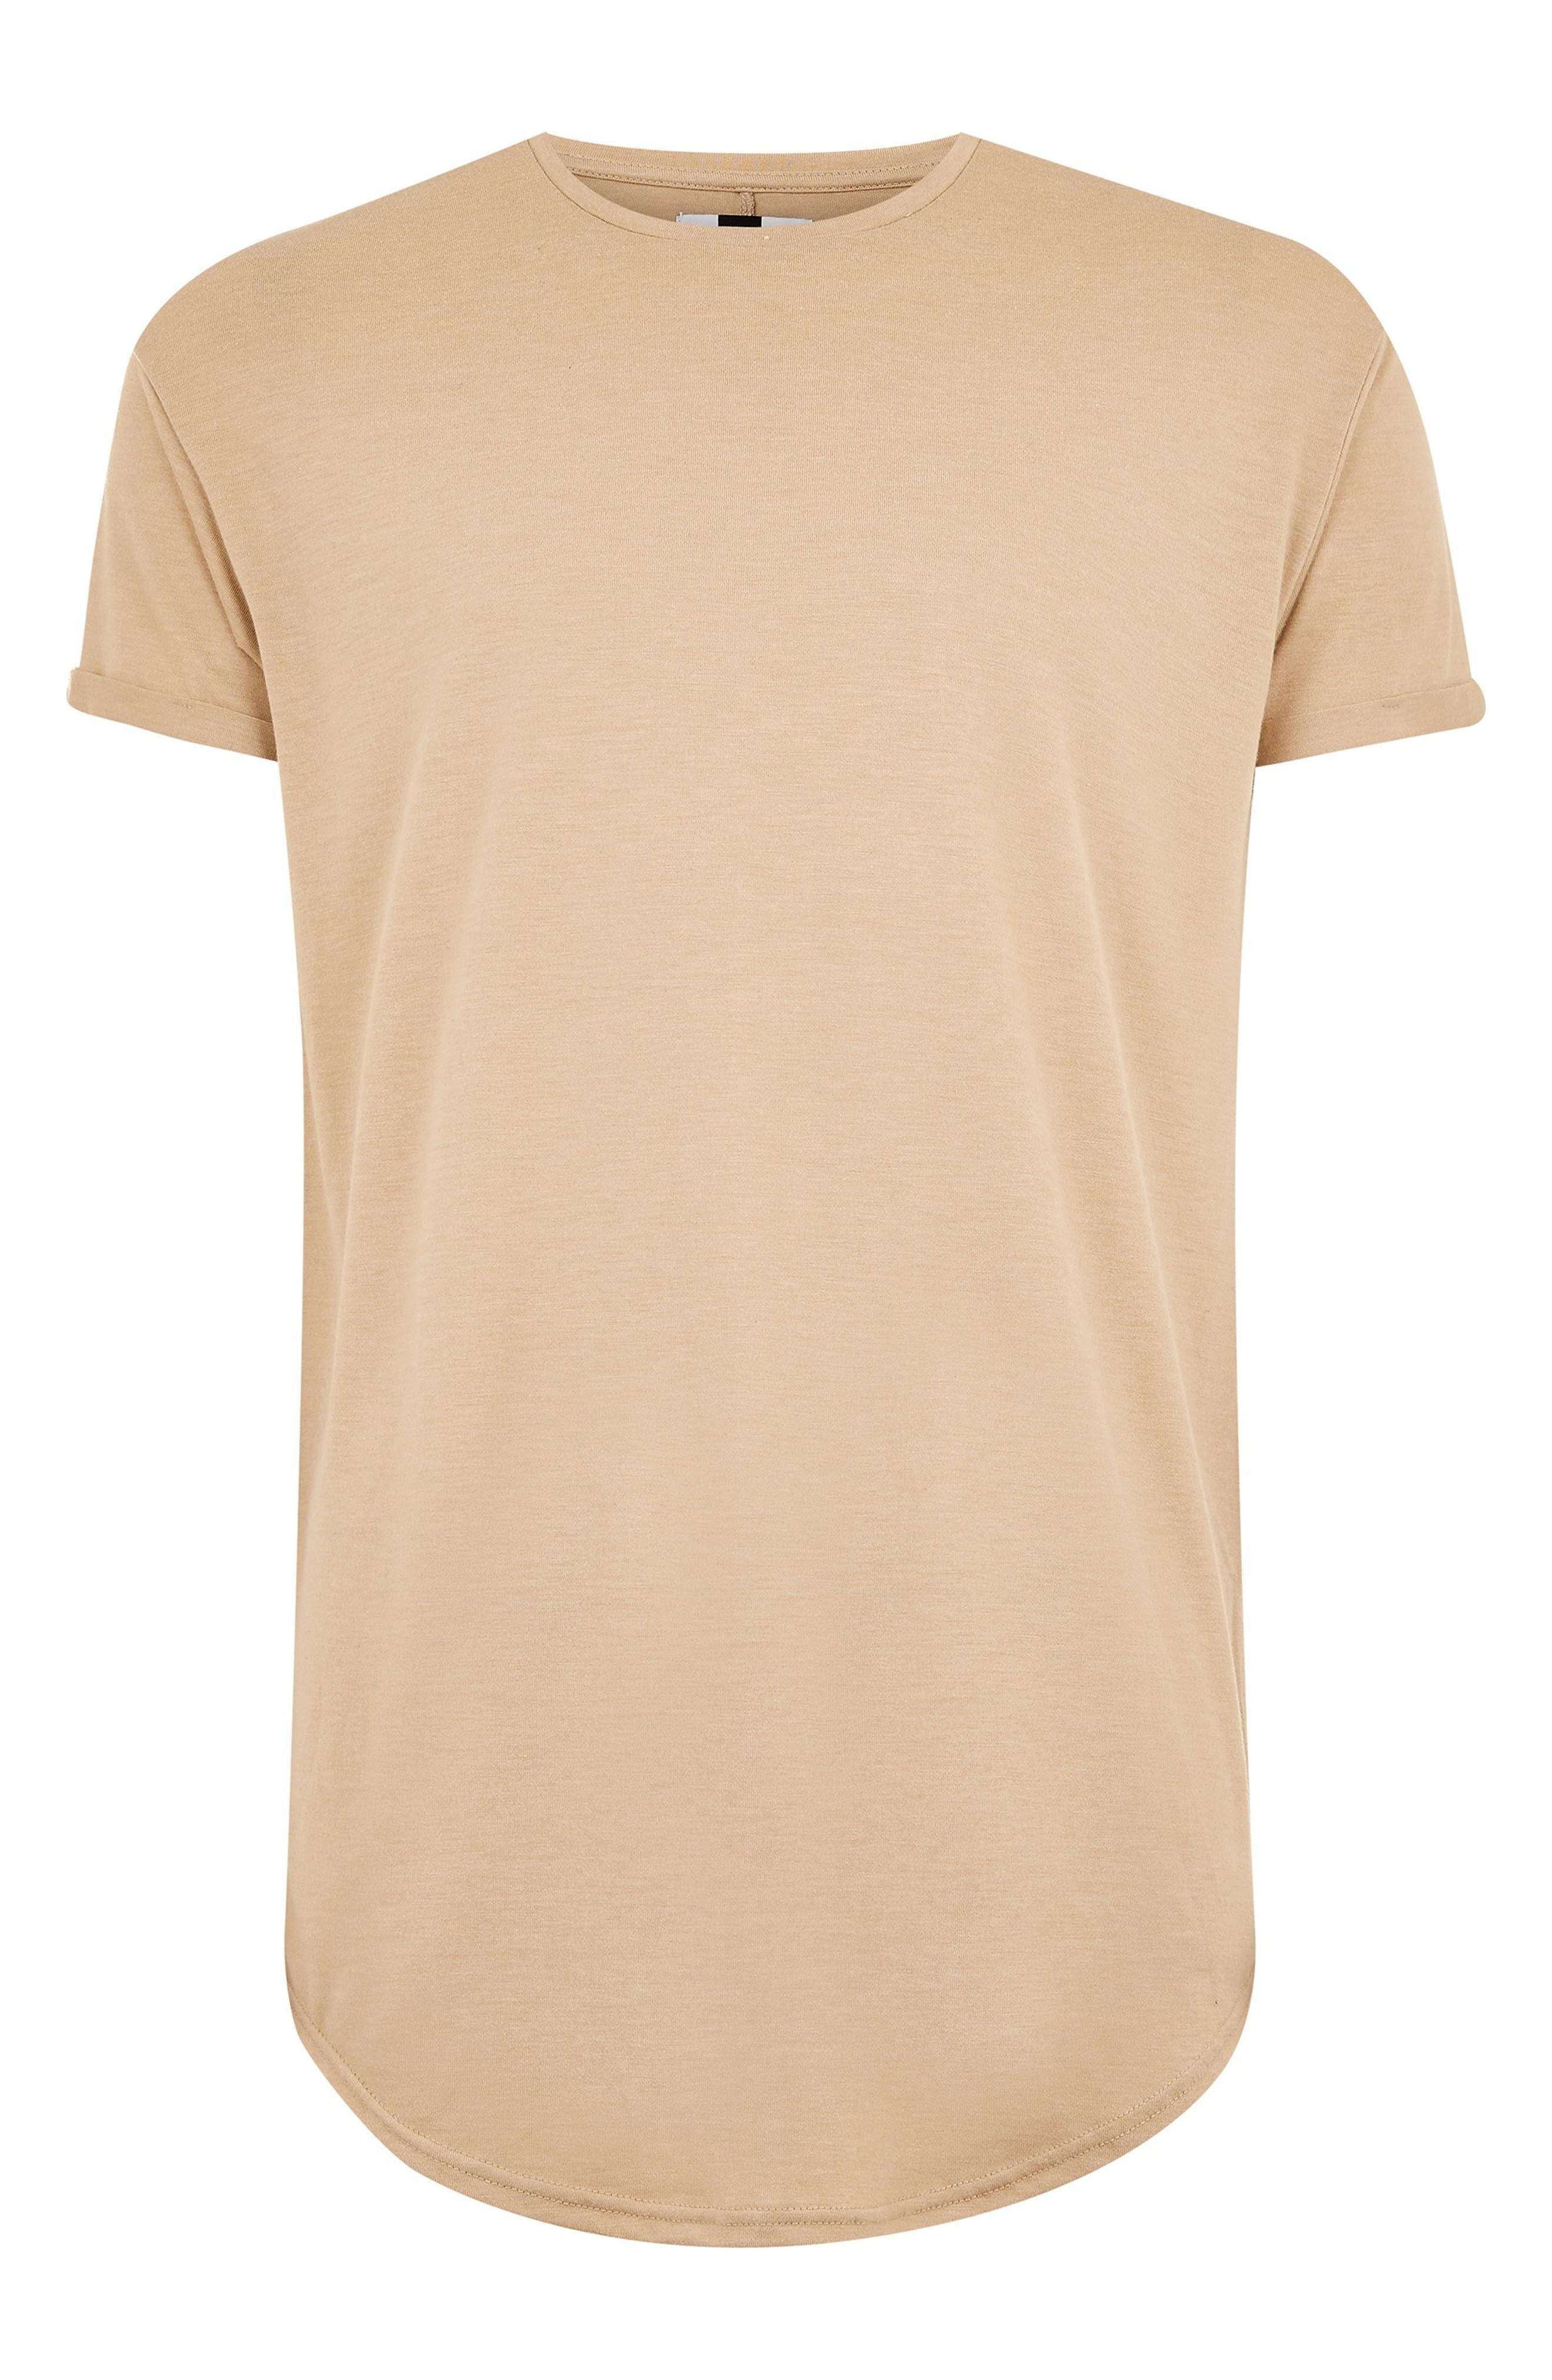 TOPMAN, Scotty Longline T-Shirt, Alternate thumbnail 5, color, STONE